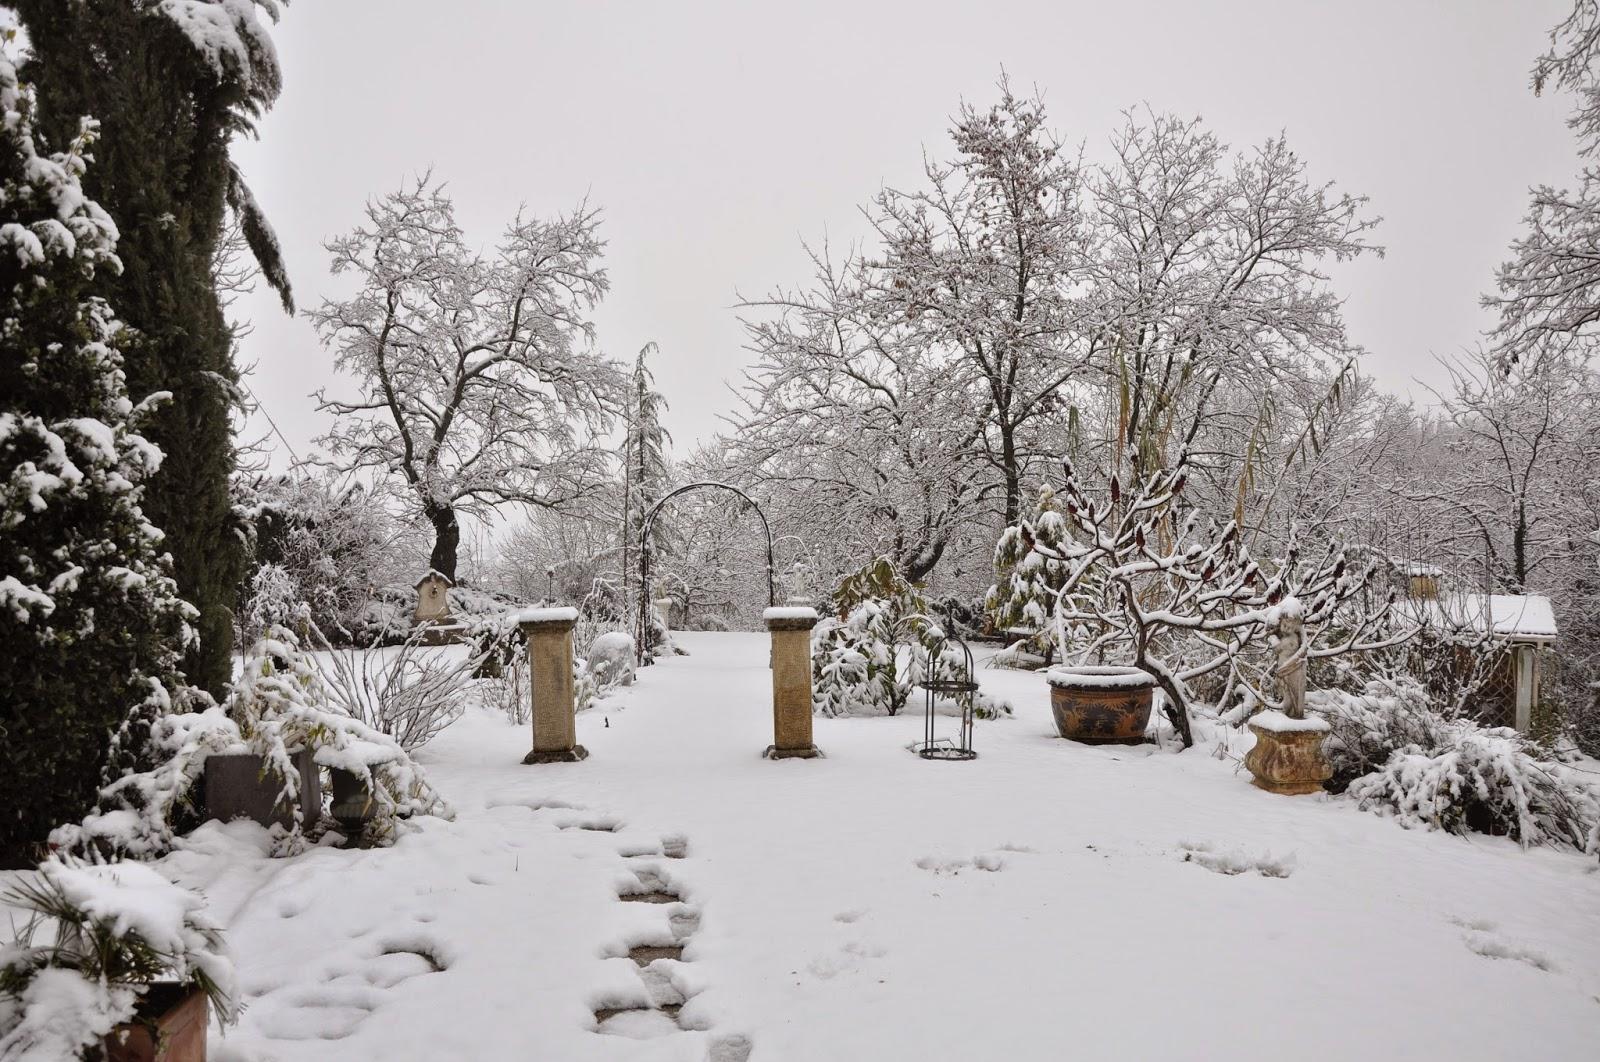 le jardin du bois joli blanche neige au bois joli. Black Bedroom Furniture Sets. Home Design Ideas